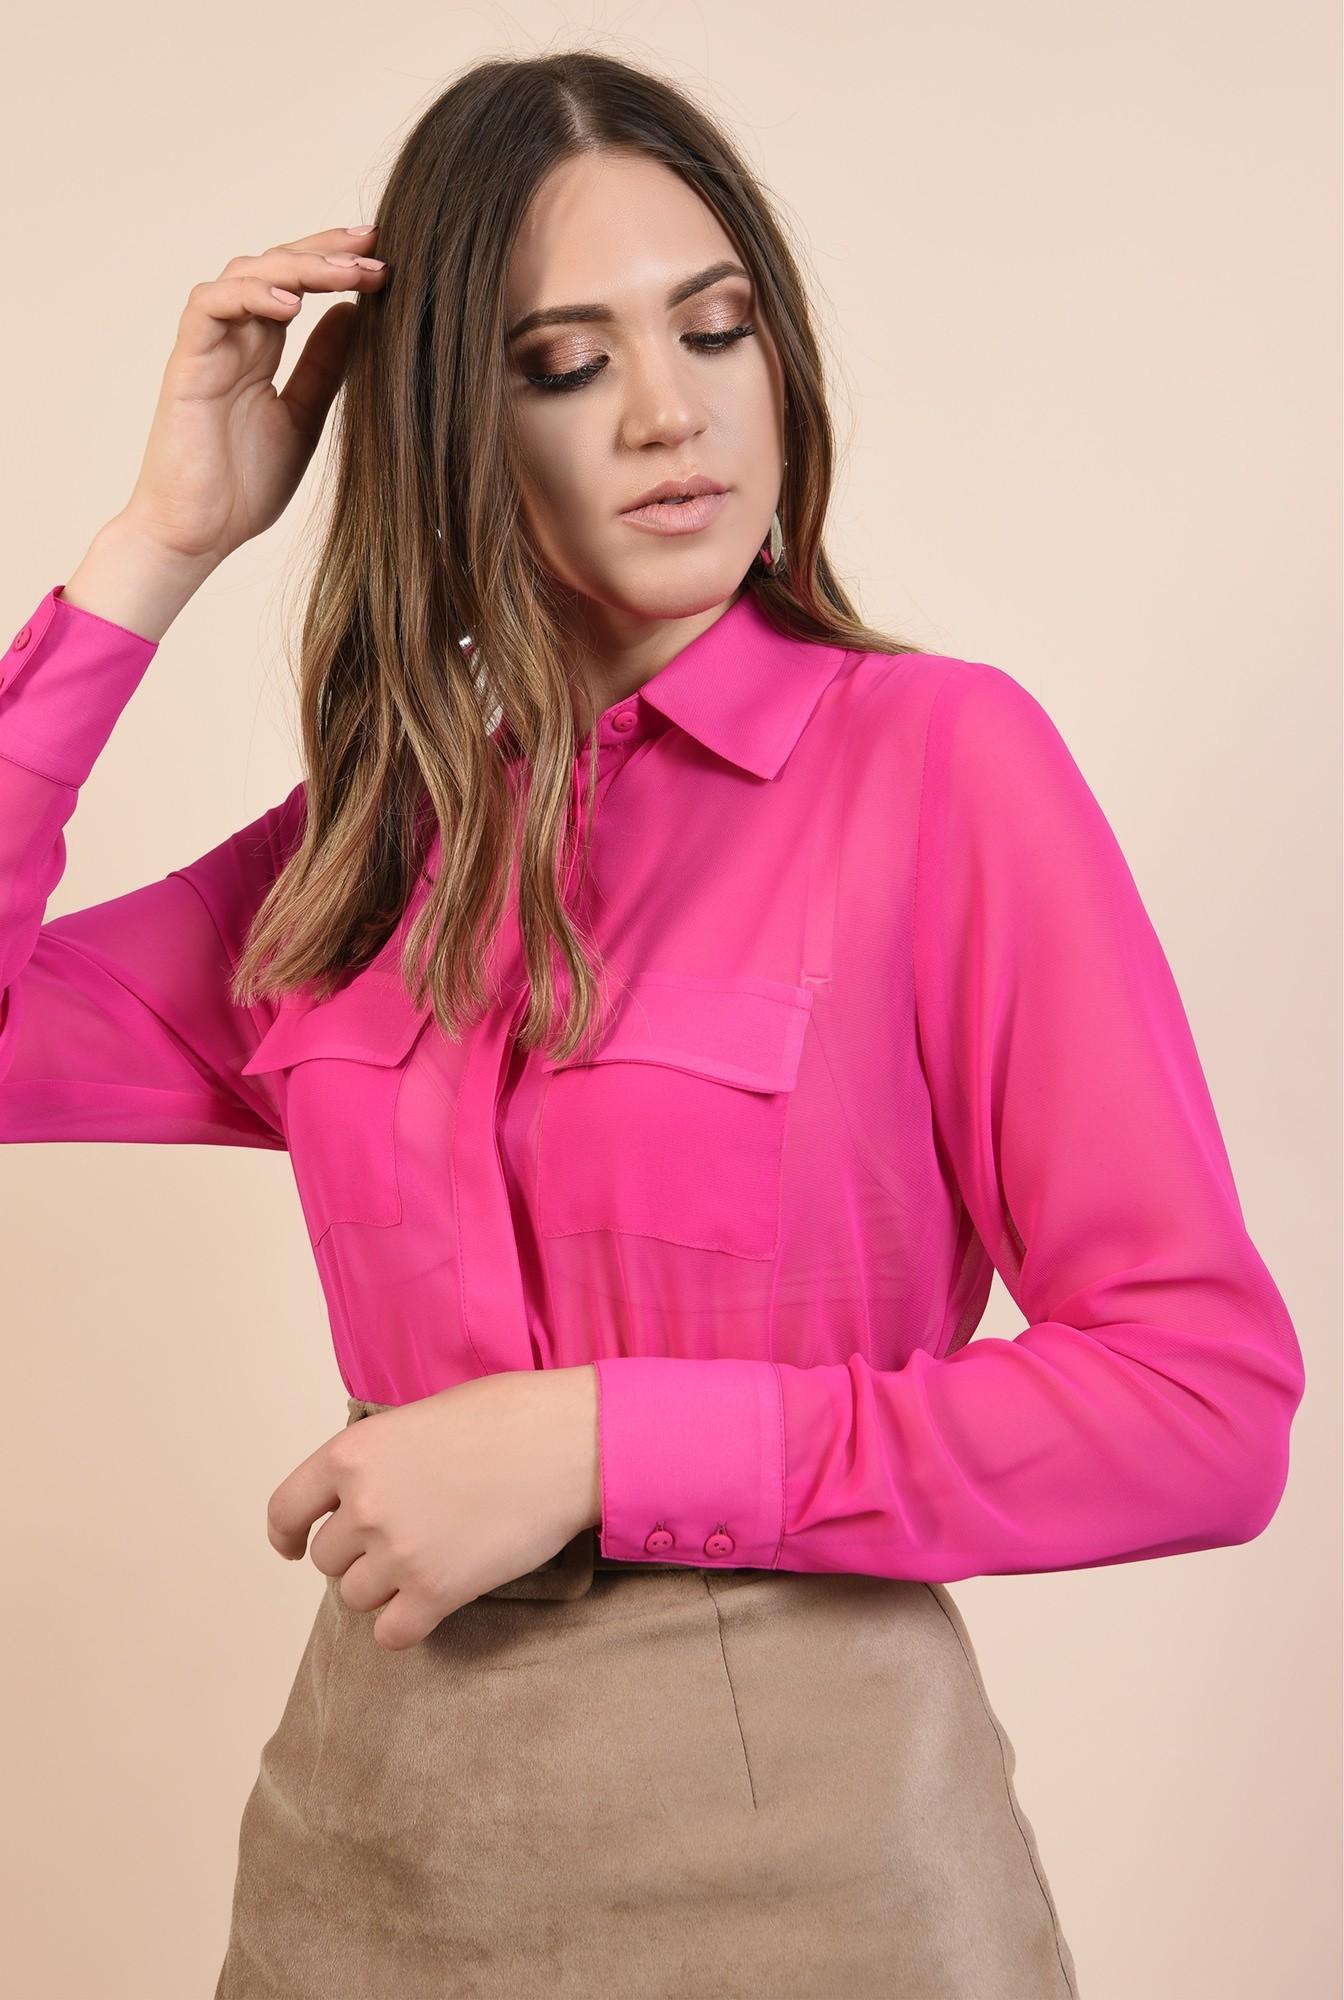 2 - camasa roz, cu buzunare la piept, maneci lungi, guler ascutit, nasturi